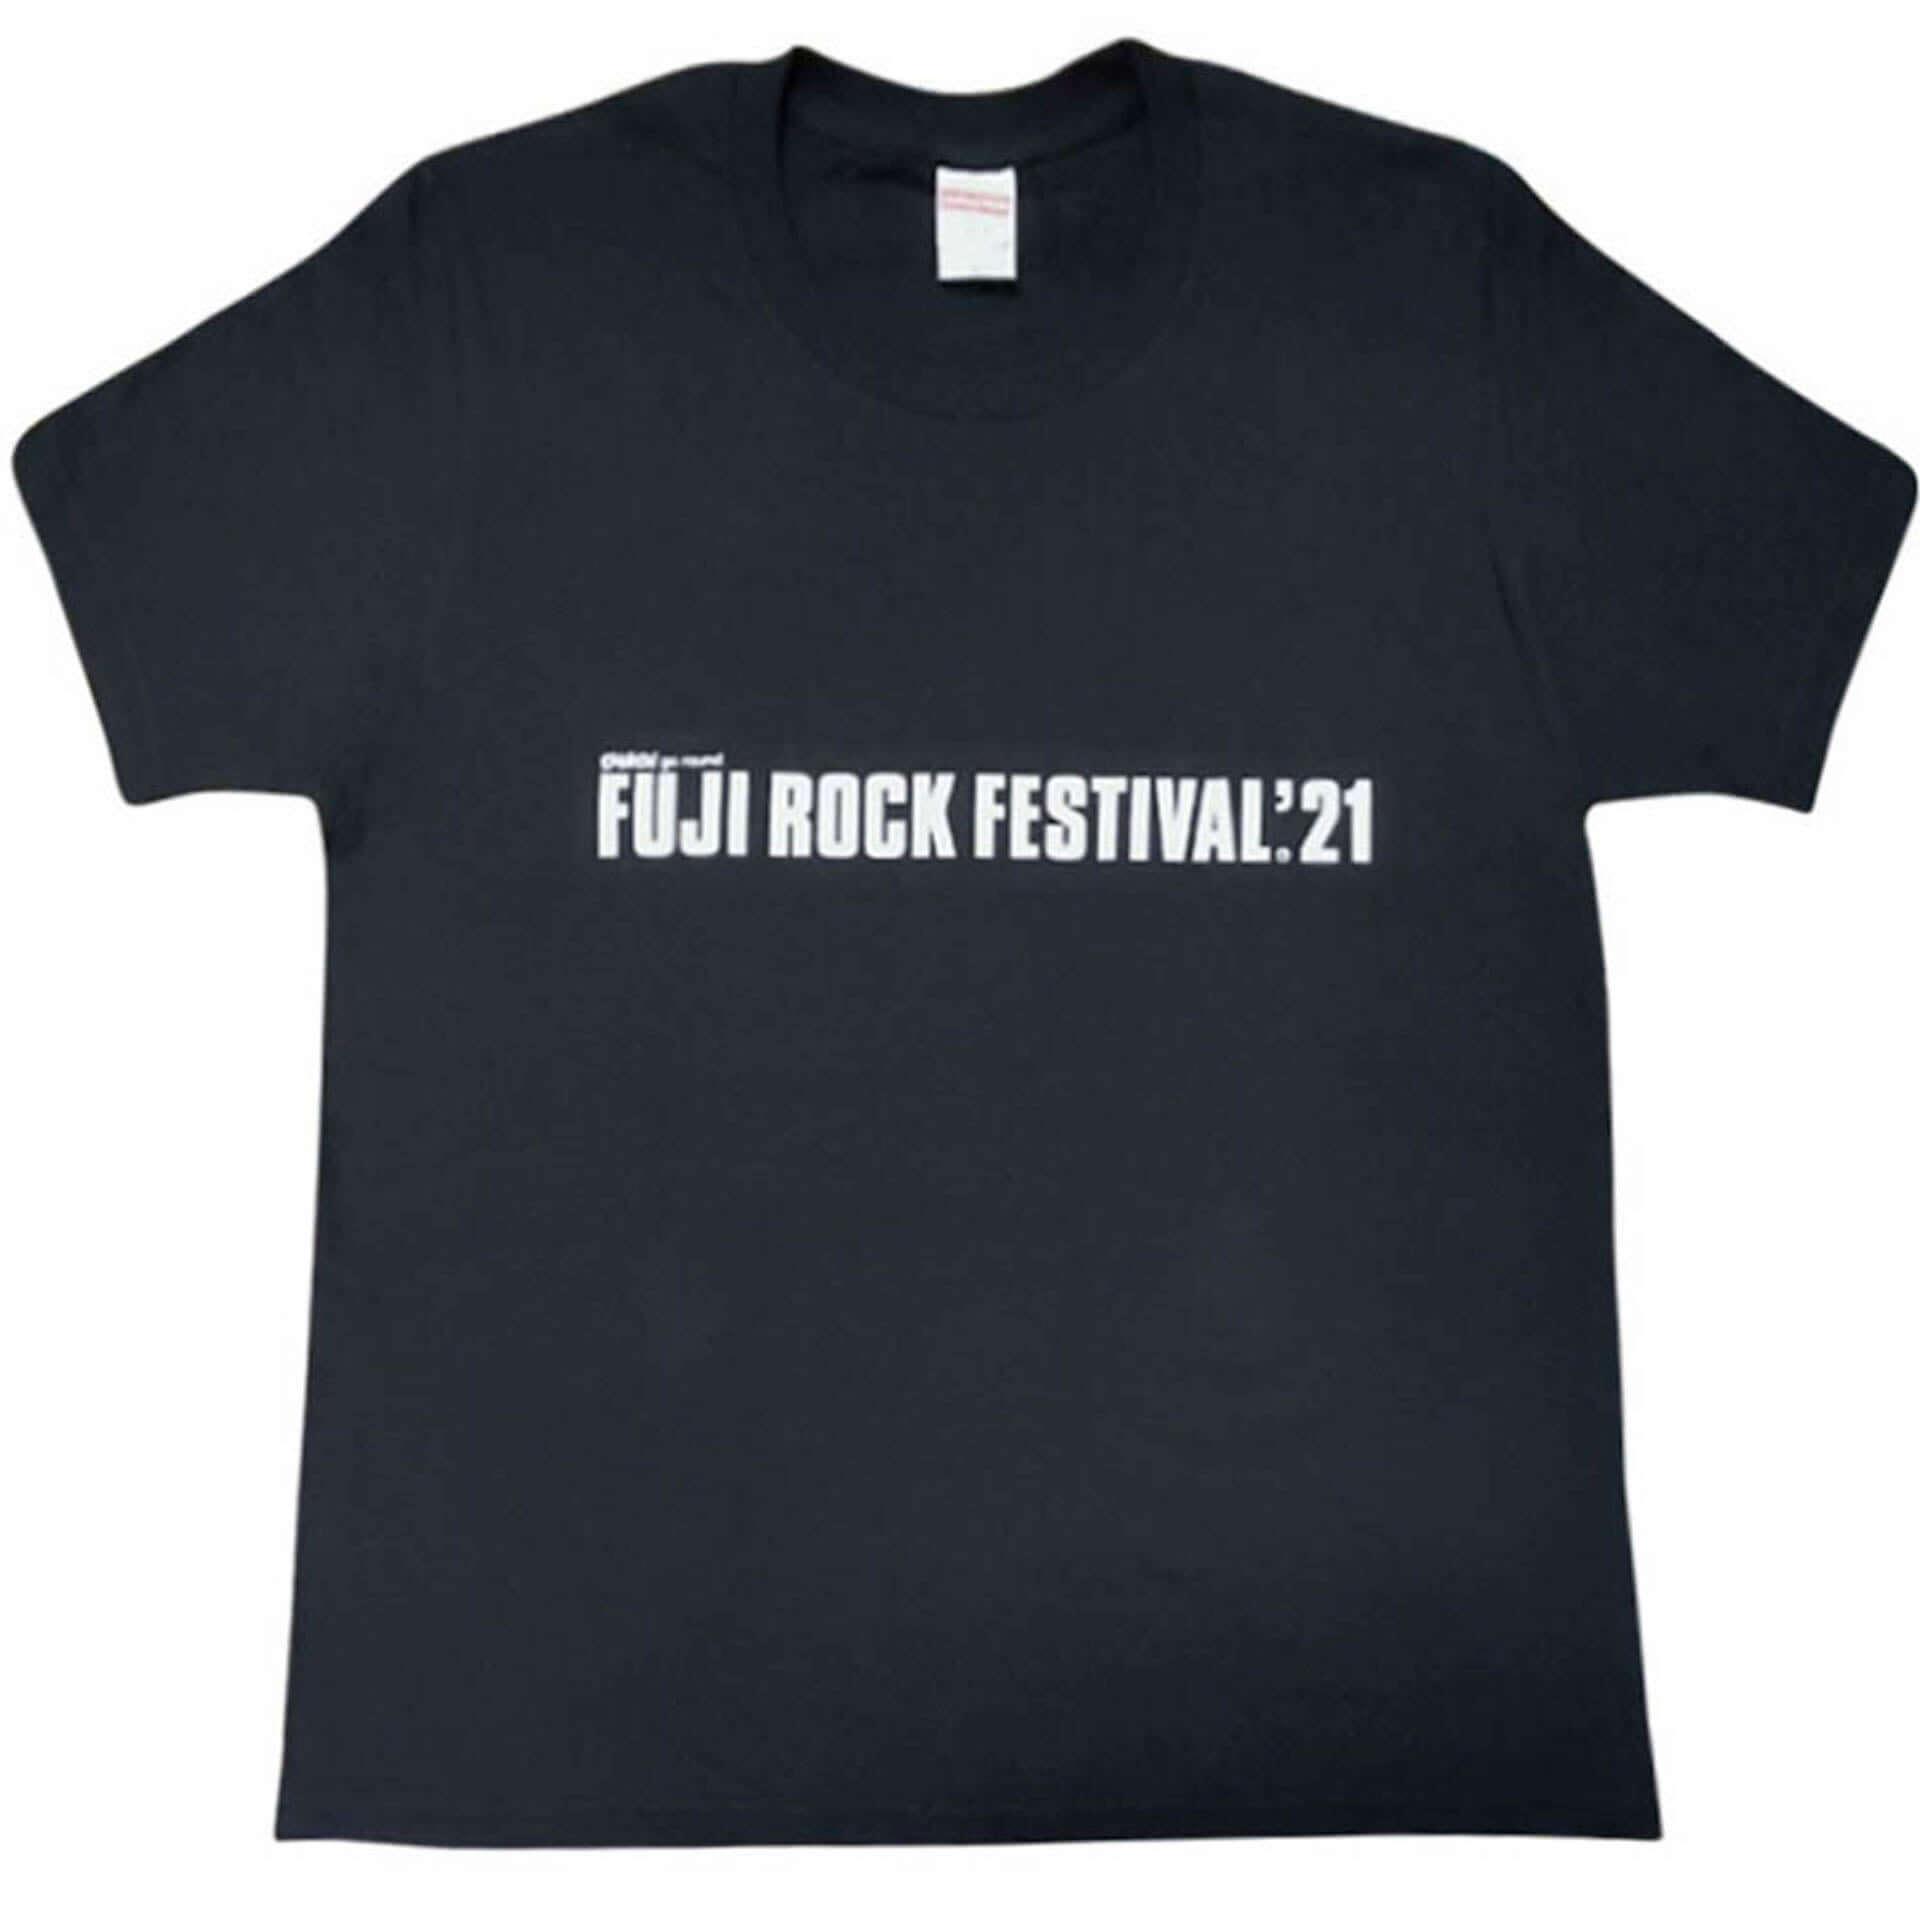 <FUJI ROCK FESTIVAL>公式グッズの新作が登場!大晦日イベント<KEEP ON FUJI ROCKIN' II>のチケットも明日発売 musicf201211_frf_17-1920x1920